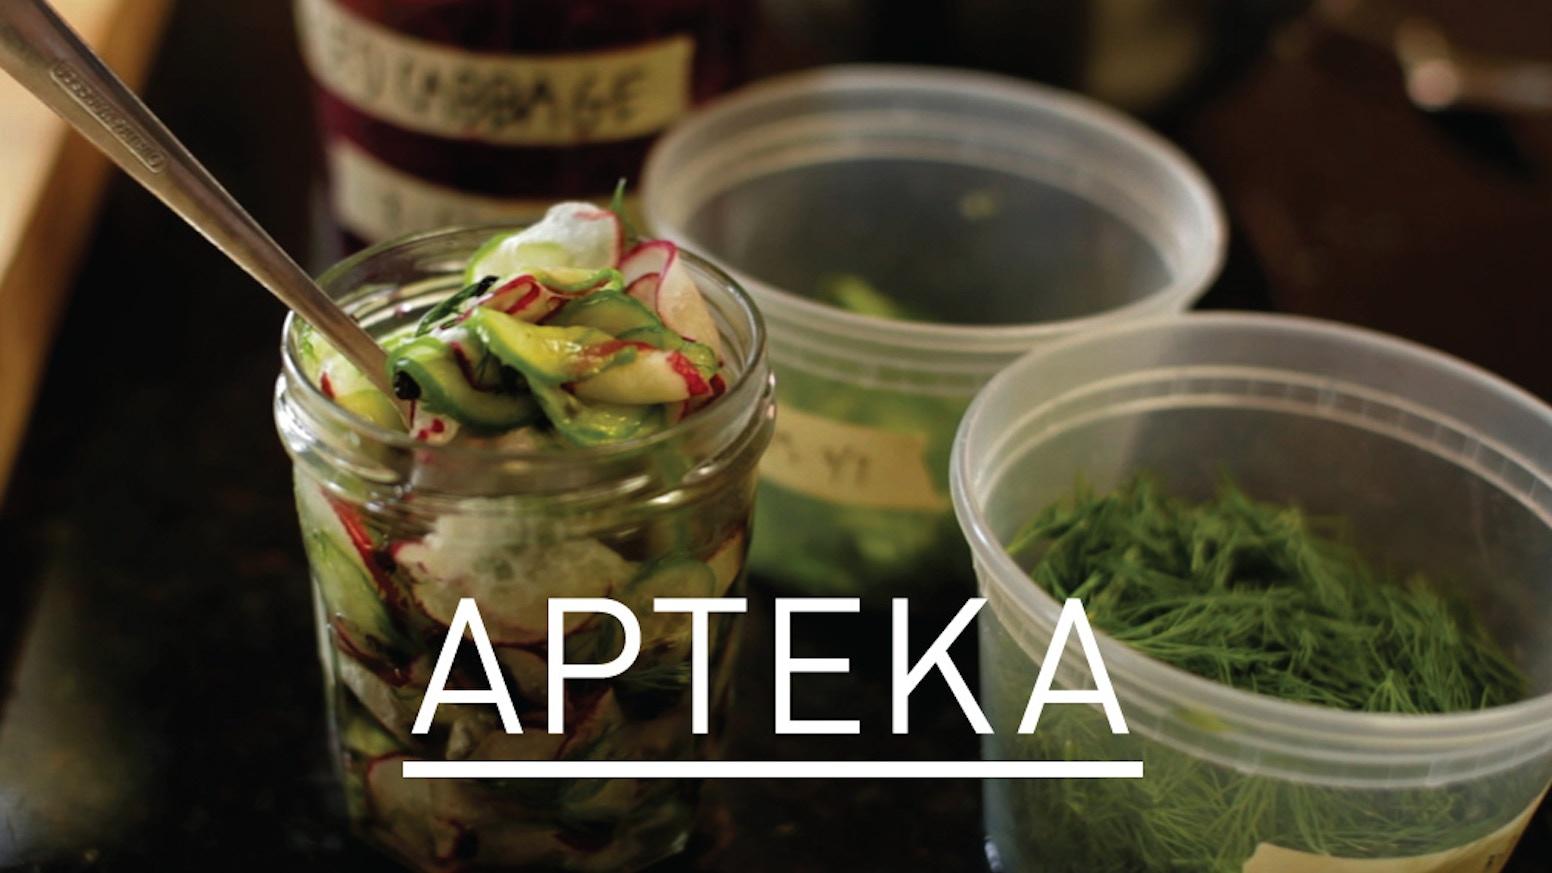 APTEKA: Eastern European Kitchen + Bar by Kate Lasky & Tomasz ...